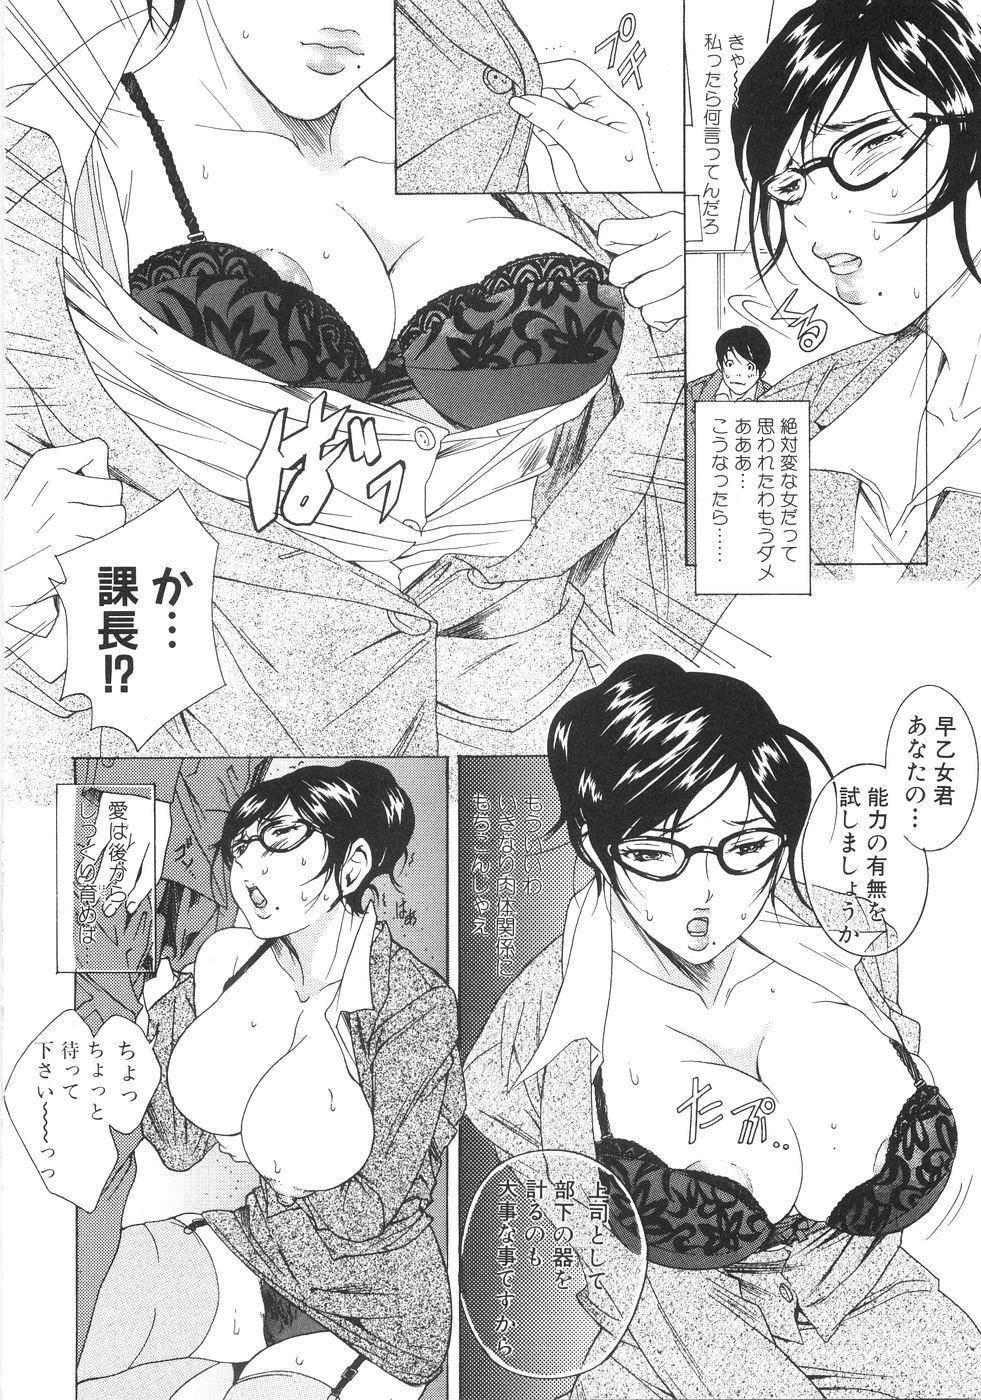 Honki Jiru - Cowper's Gland Liquid? or Love Juice?...?! 42